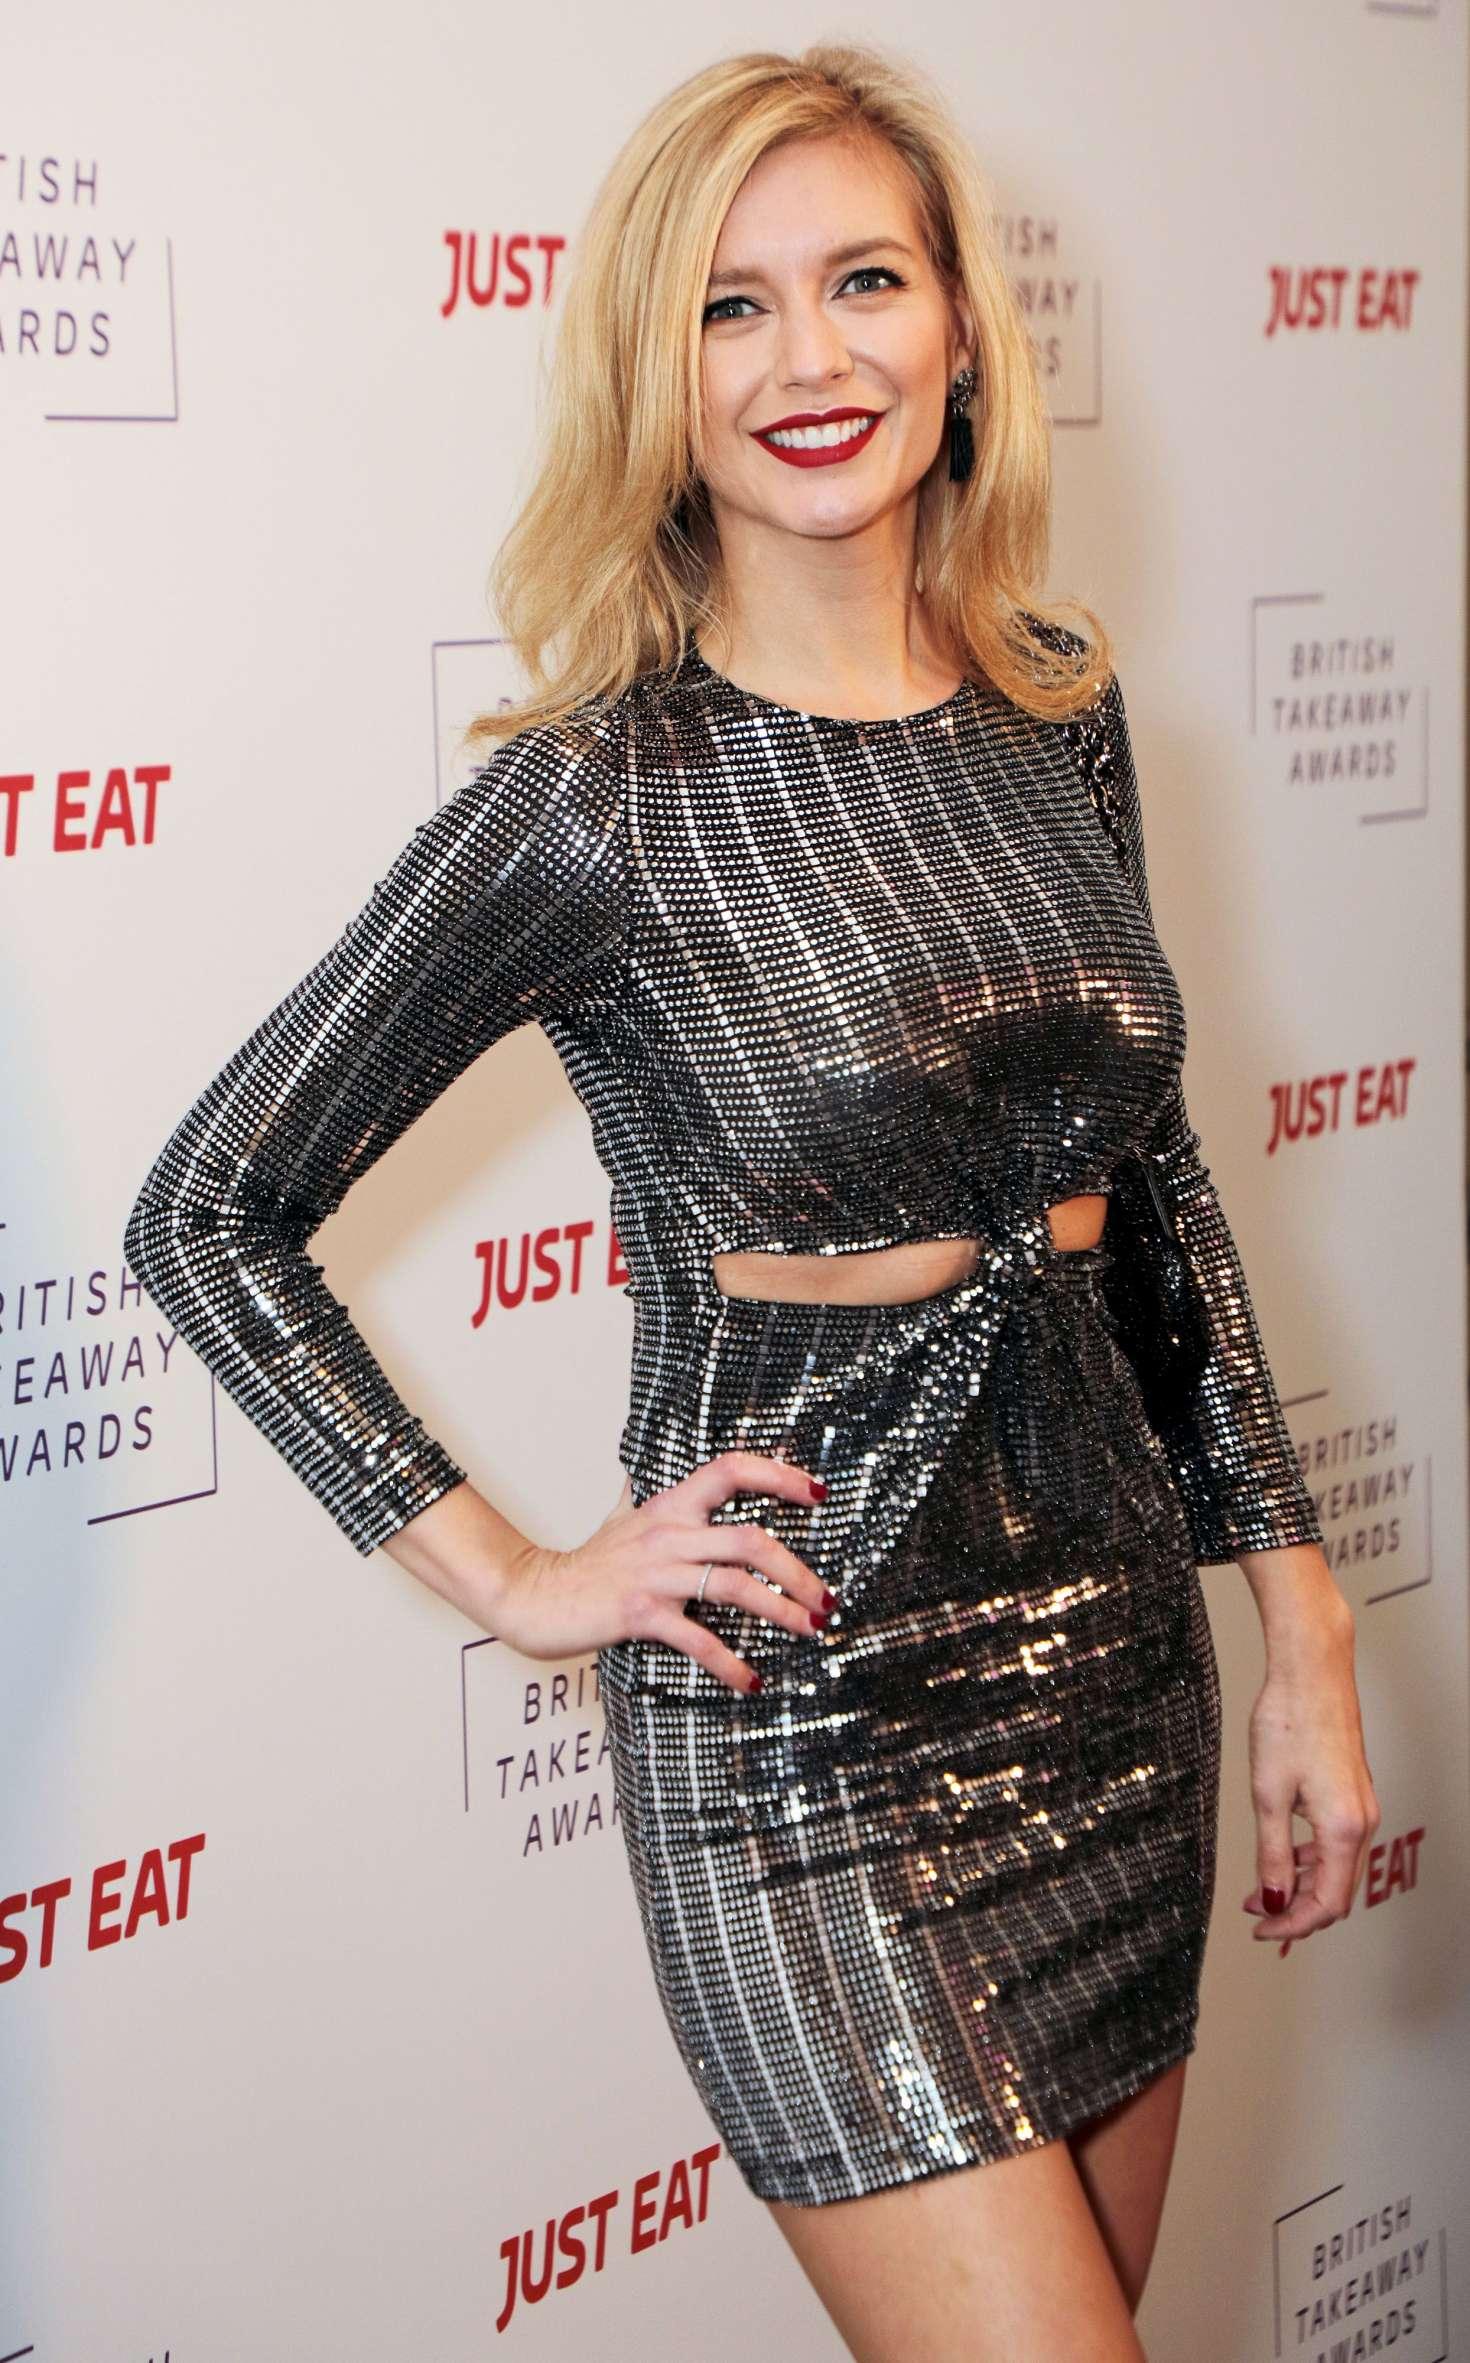 Rachel Riley - 2018 British Takeaway Awards in London